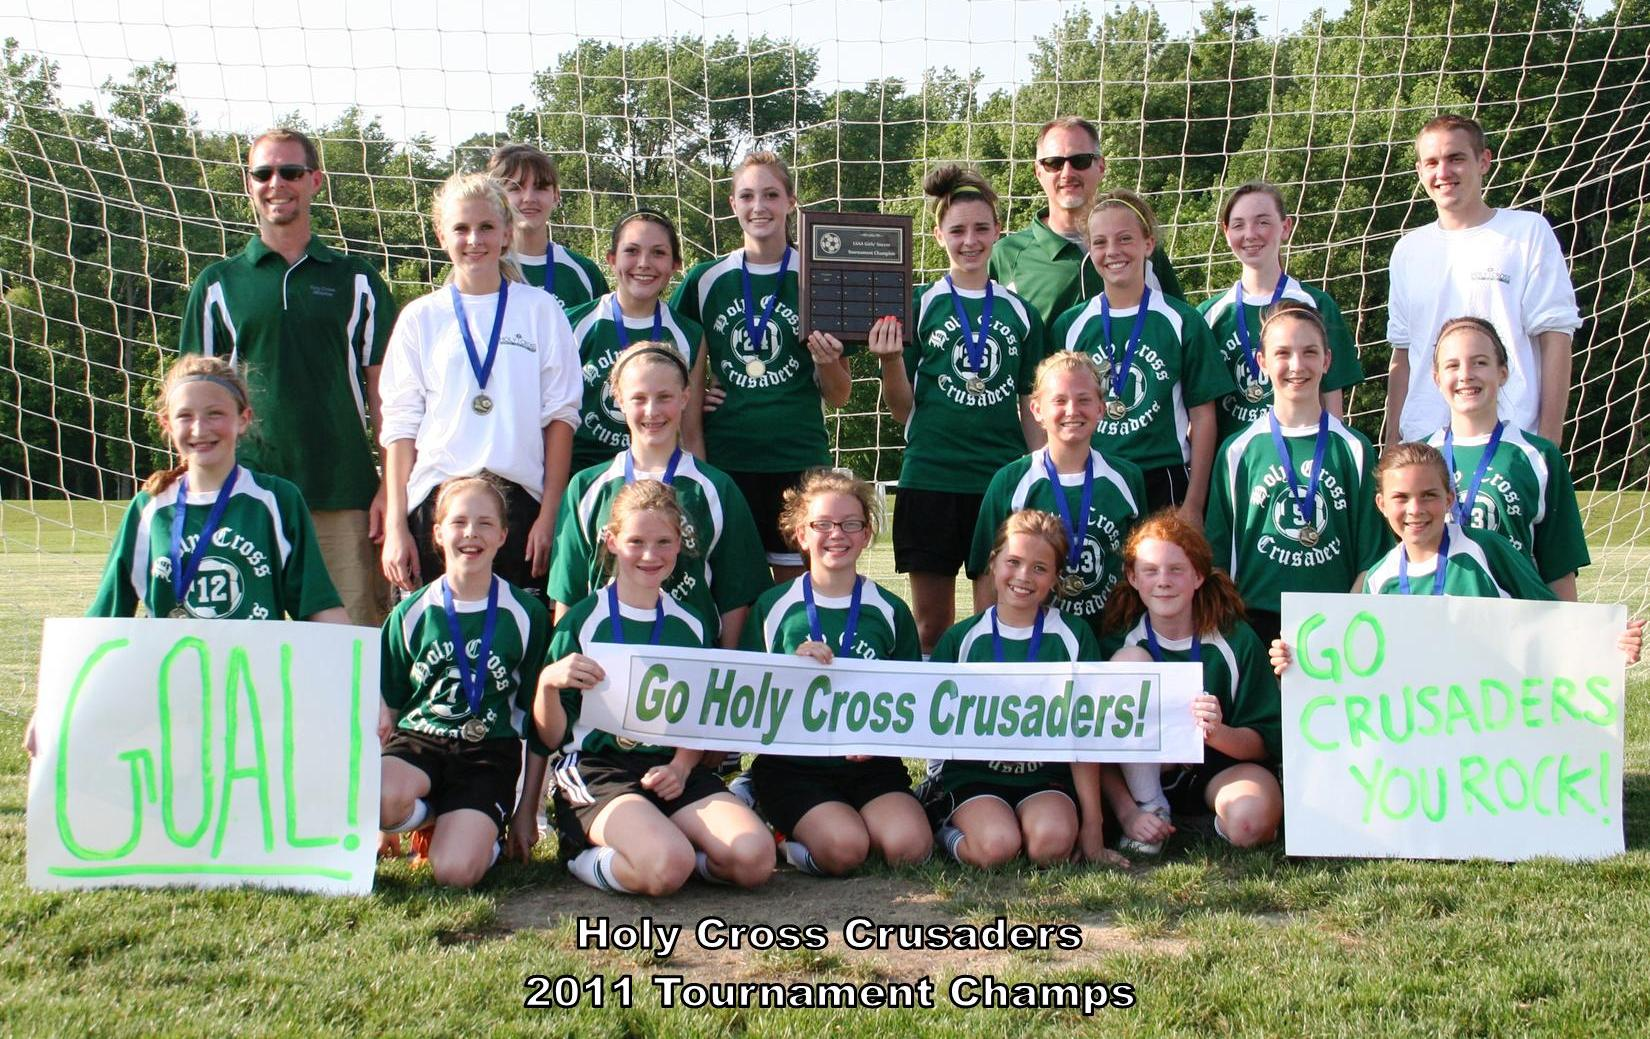 2011 Holy Cross Crusaders